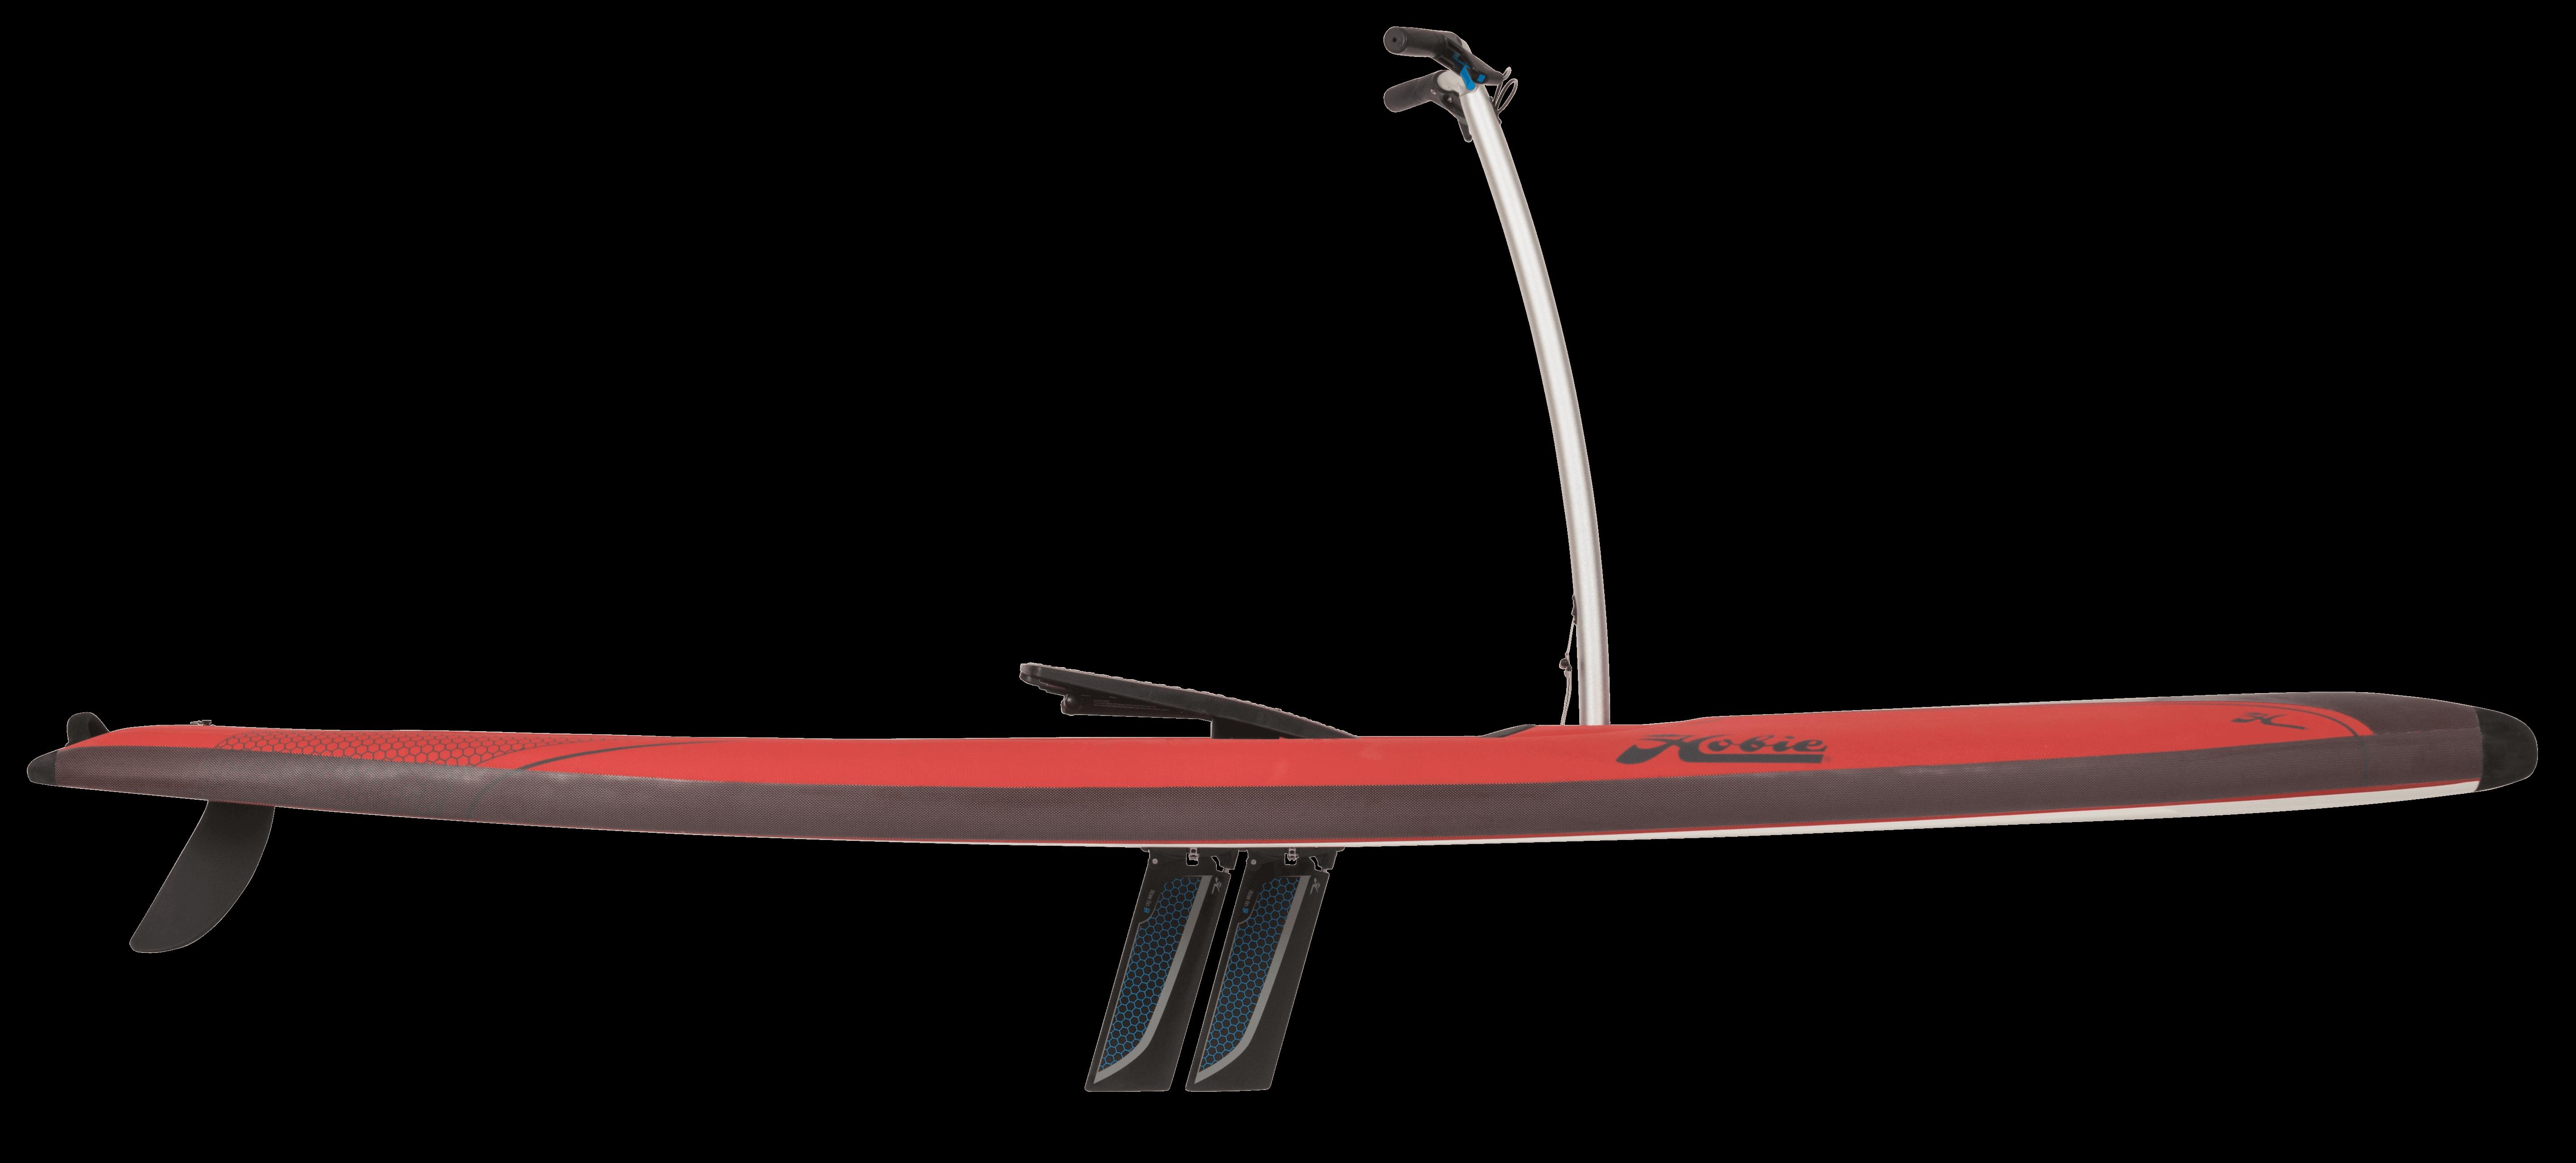 Hobie S Mirage Eclipse Dura Series Hobie Mirage Hobie Kayaks For Sale Standup Paddle